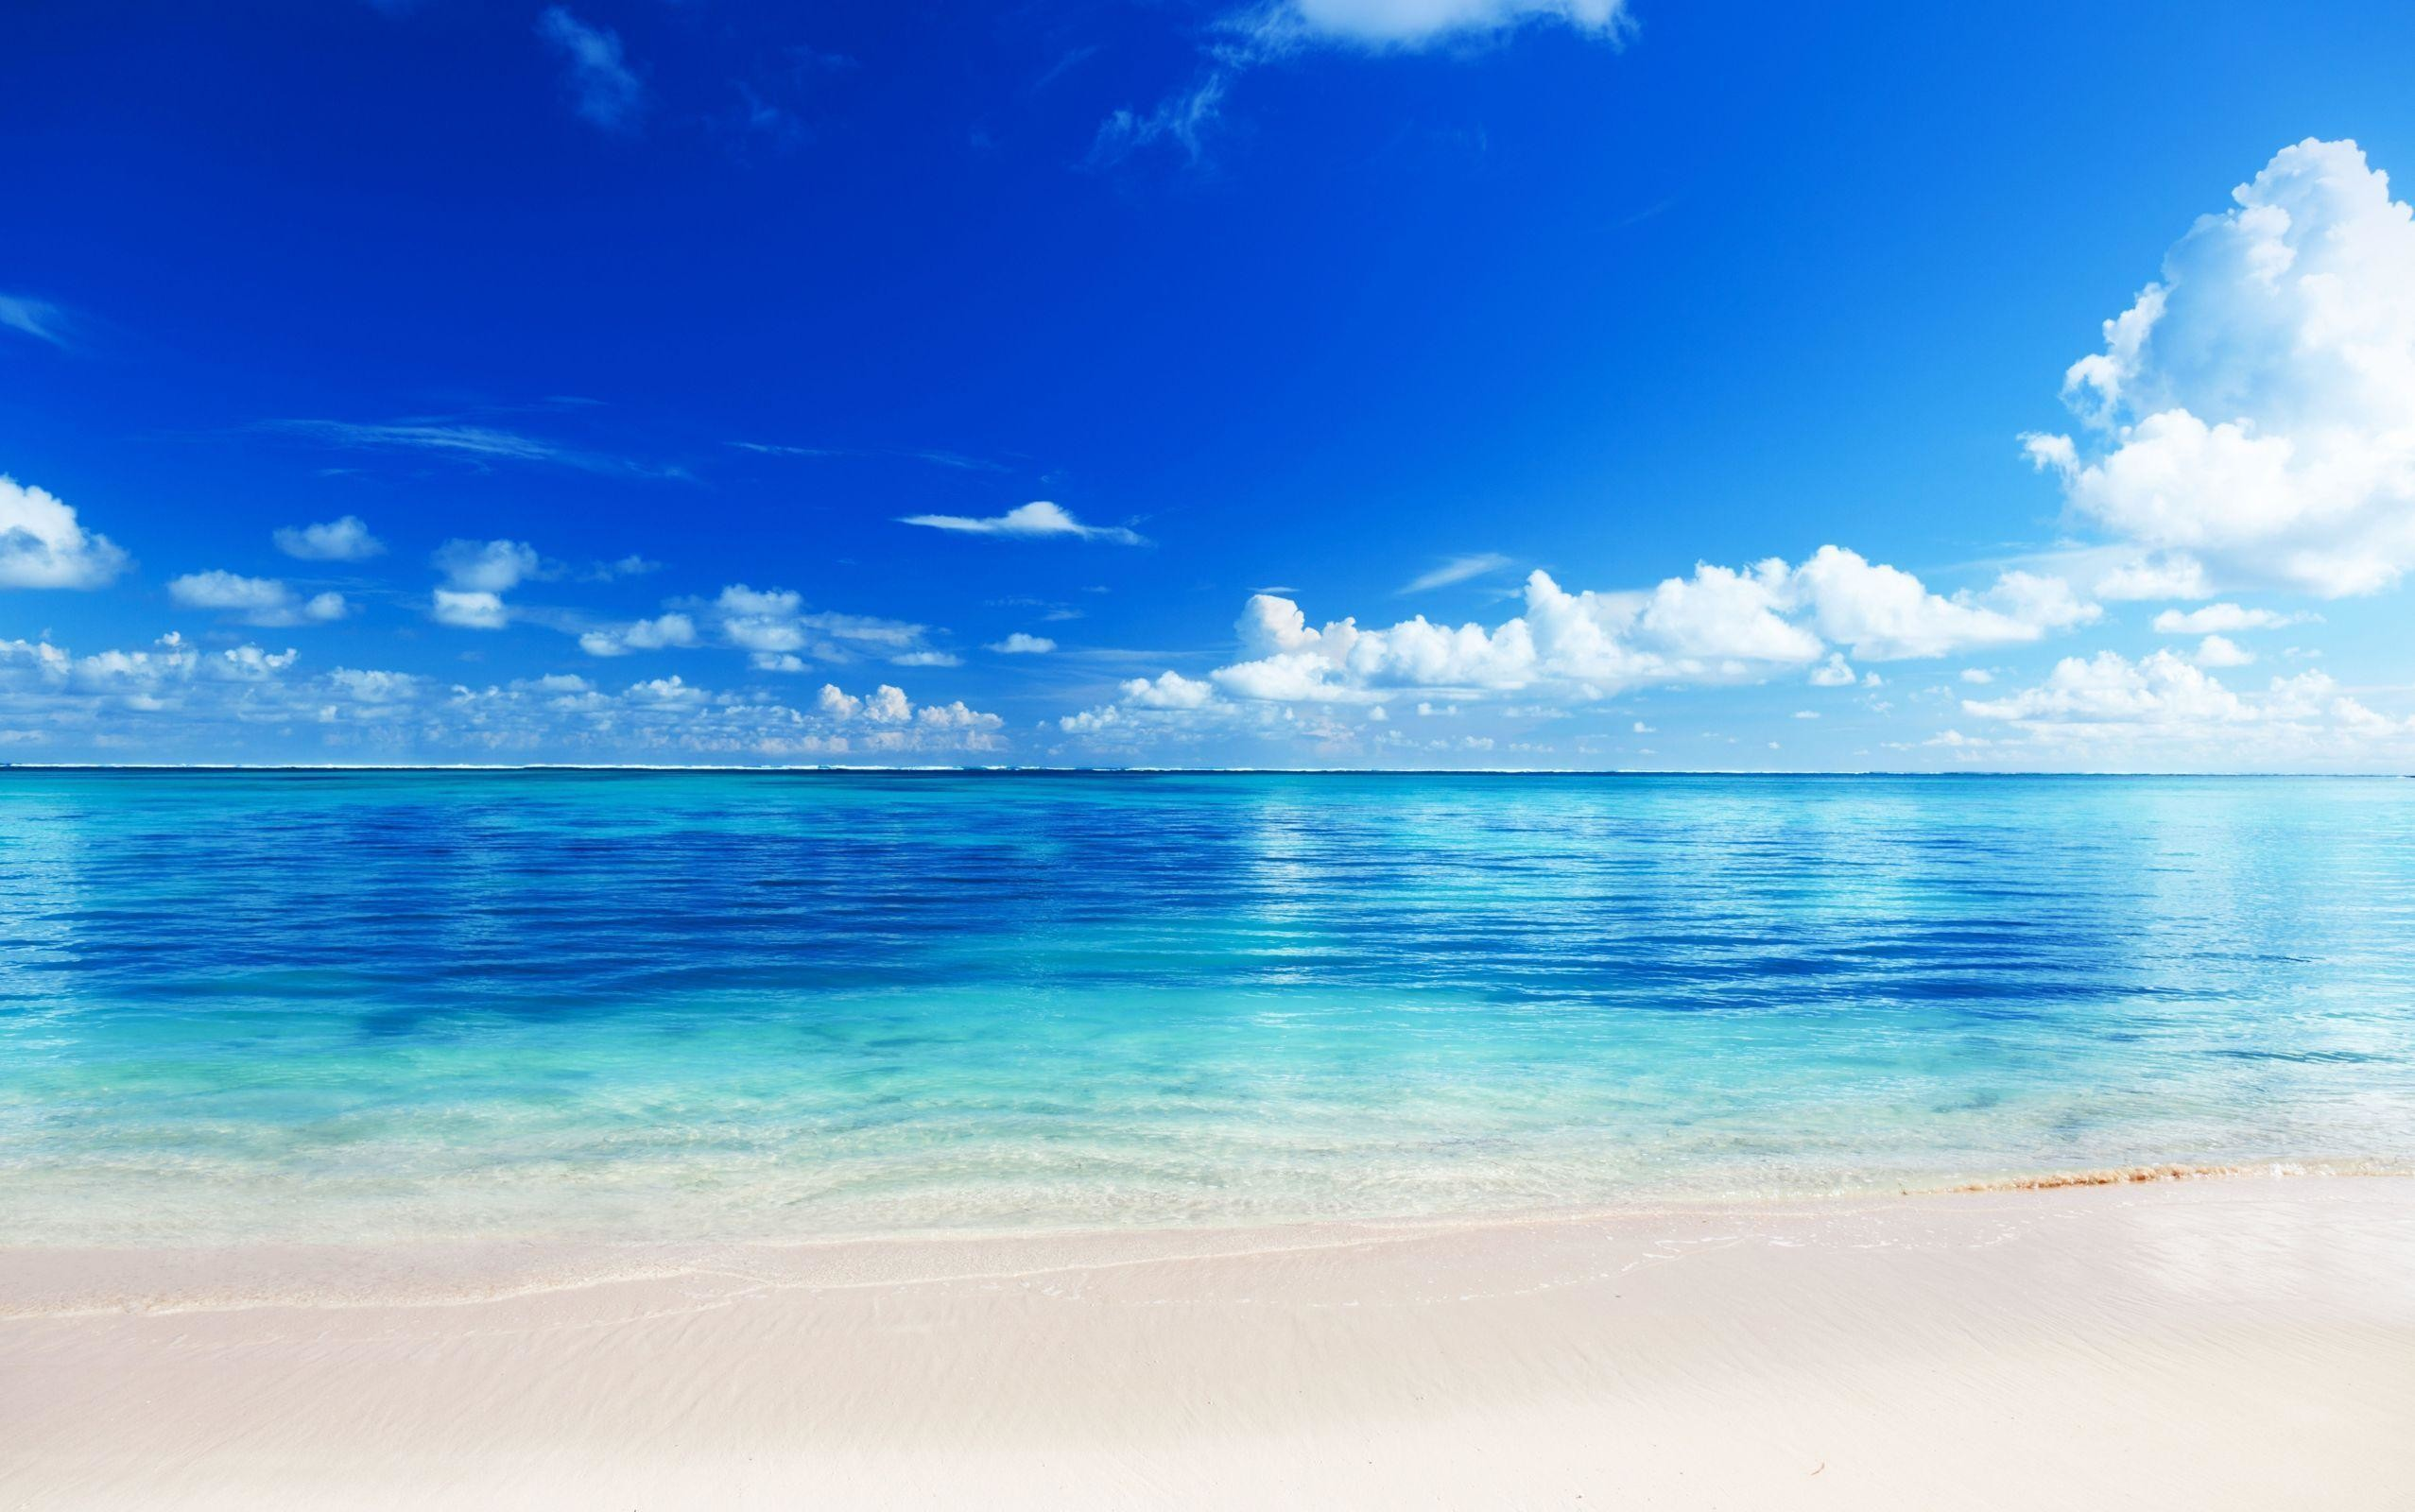 Hd Beach Desktop Backgrounds 59 Pictures